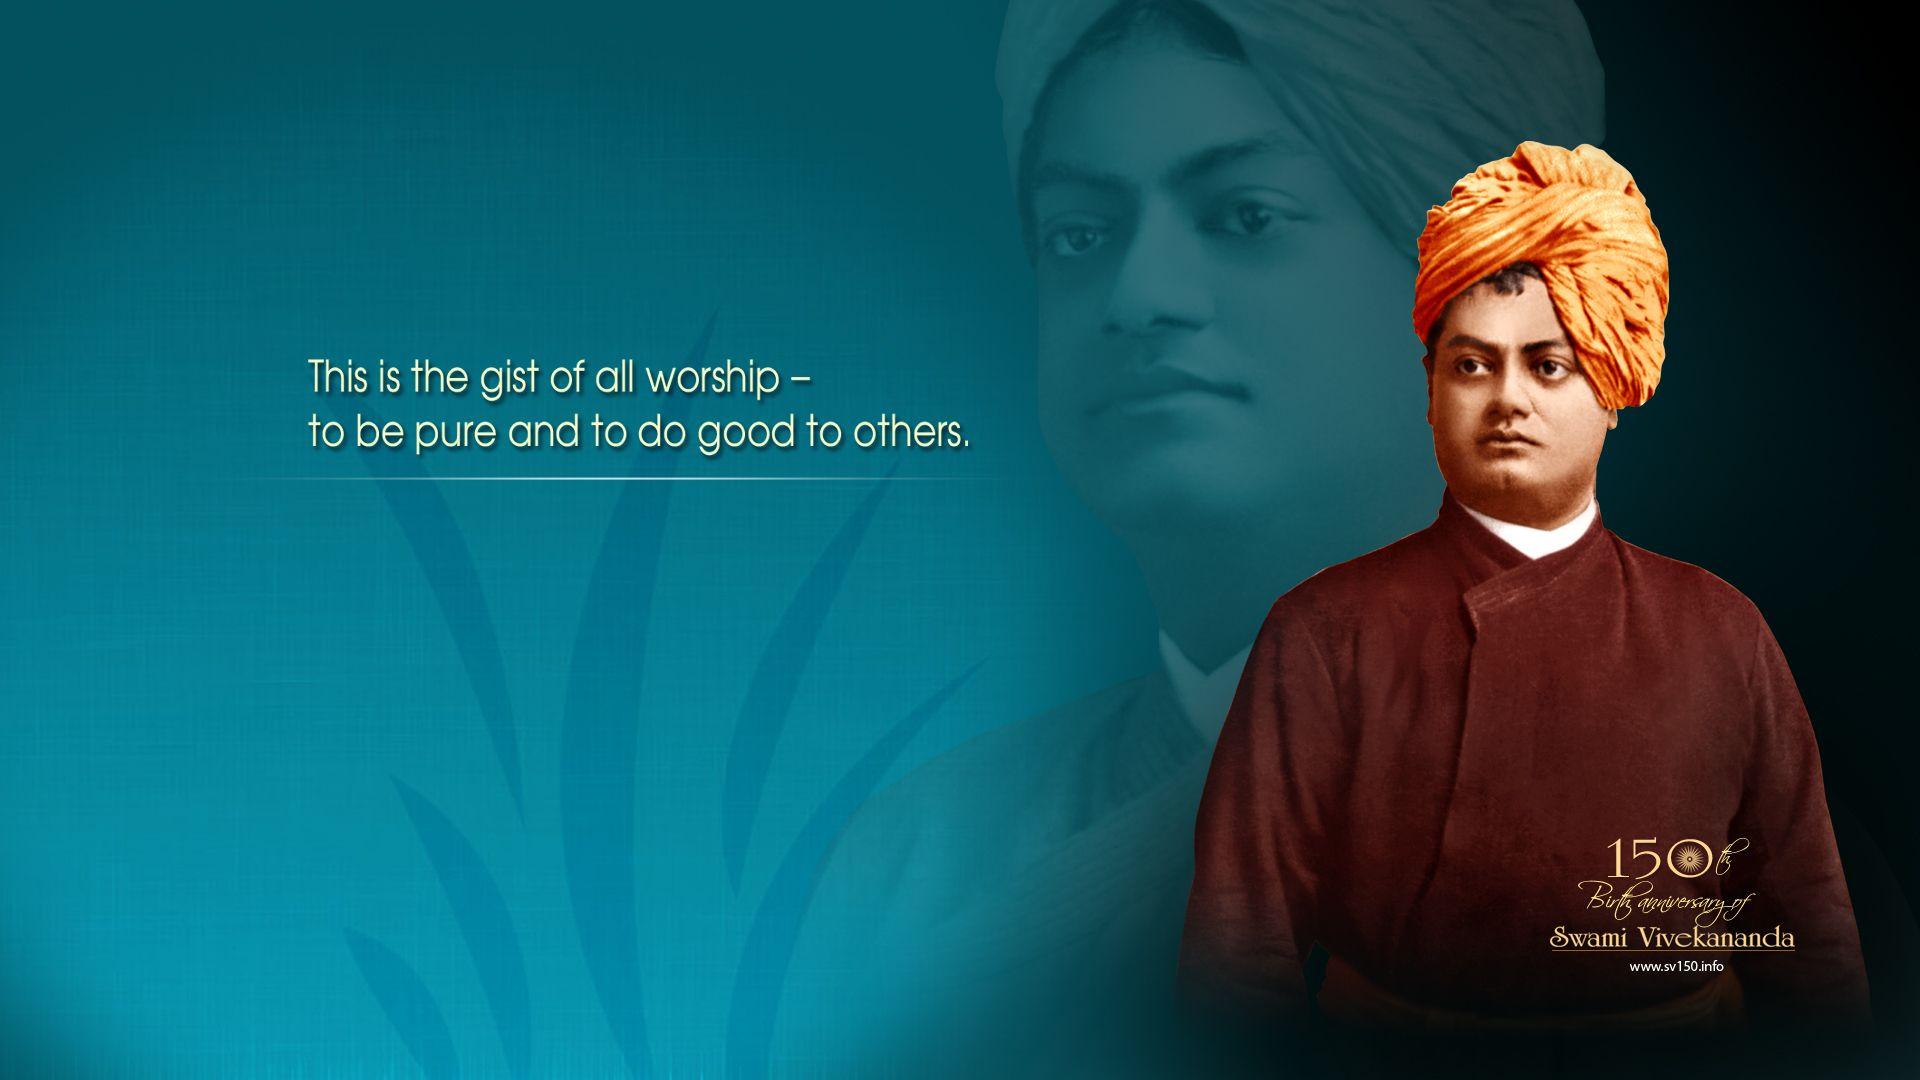 Be Make Swami Vivekananda Positive Quotes Wallpaper Wallpaper Quotes Positive Quotes